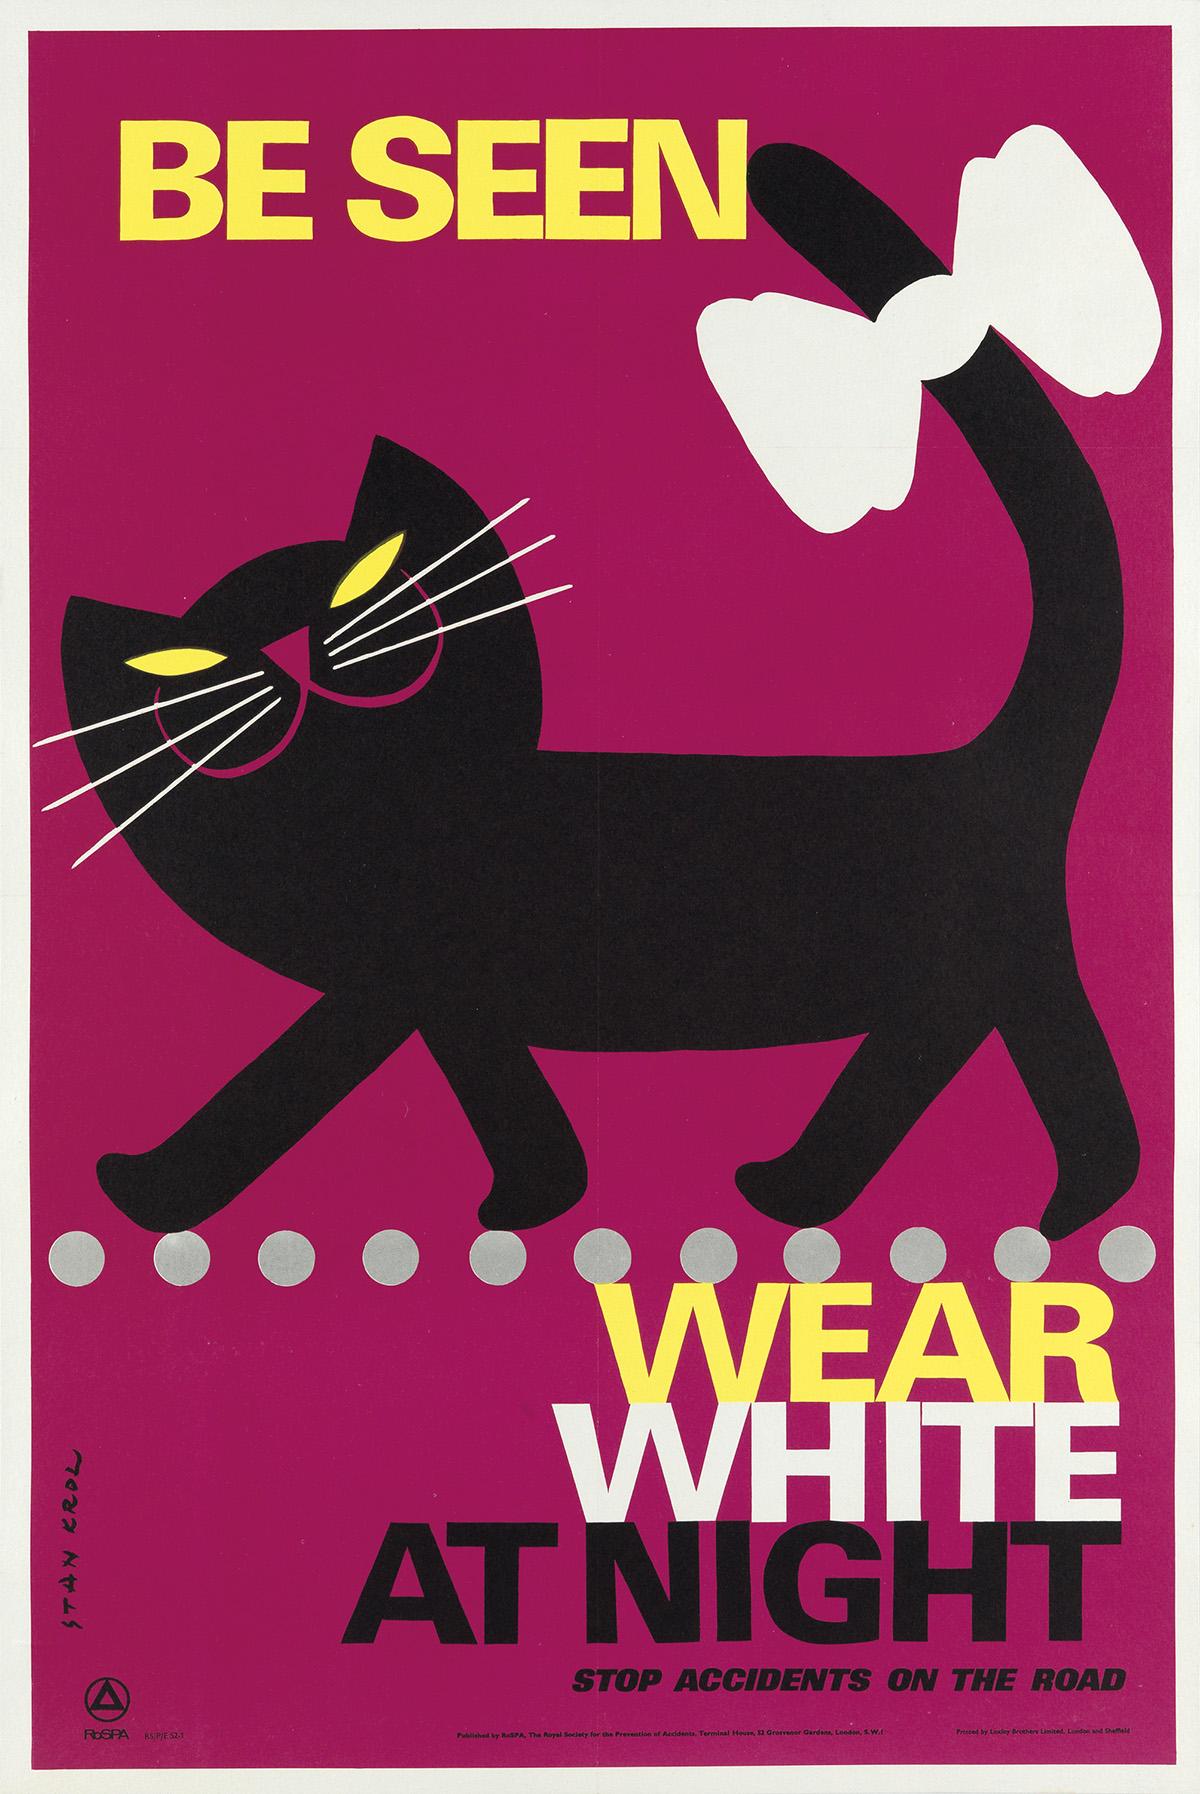 STAN-KROL-(1910-1985)-BE-SEEN--WEAR-WHITE-AT-NIGHT-Circa-196